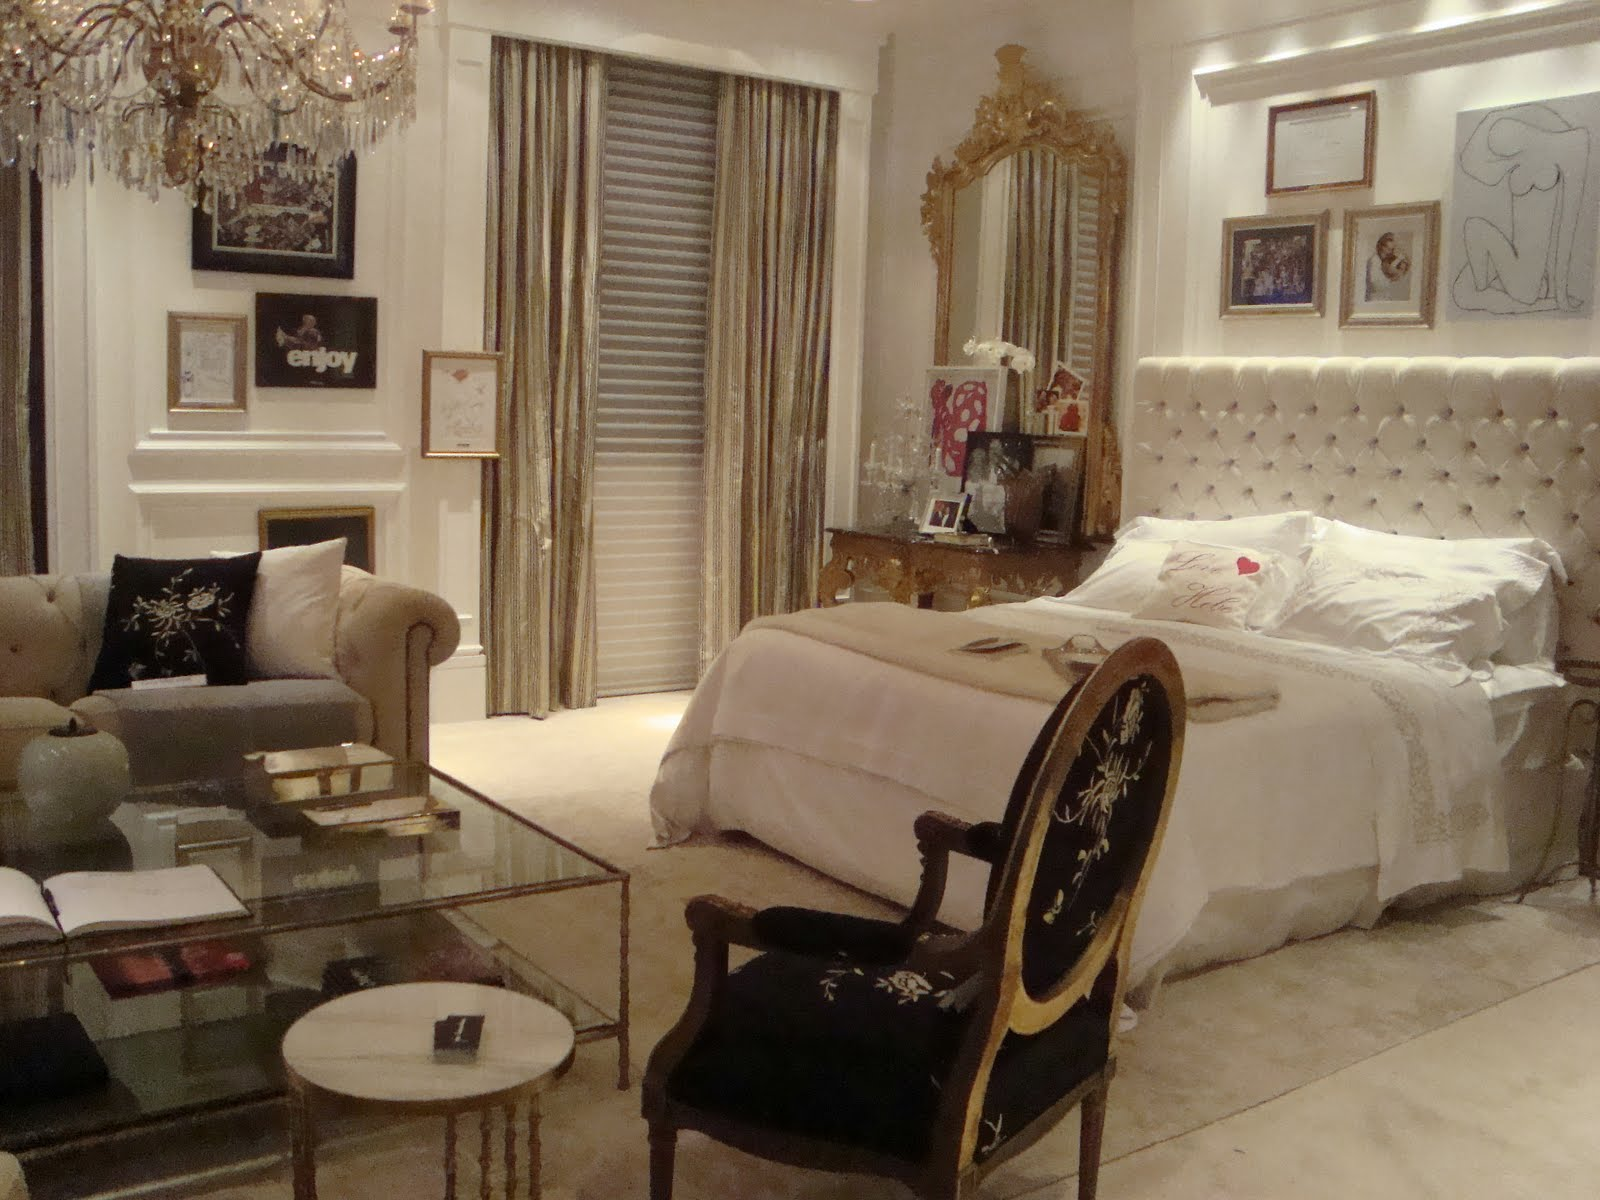 decoracao de interiores quarto de casal:dicas-de-decoracao-de-quarto-casa-cor-2009-suite-hebe-camargo-joao